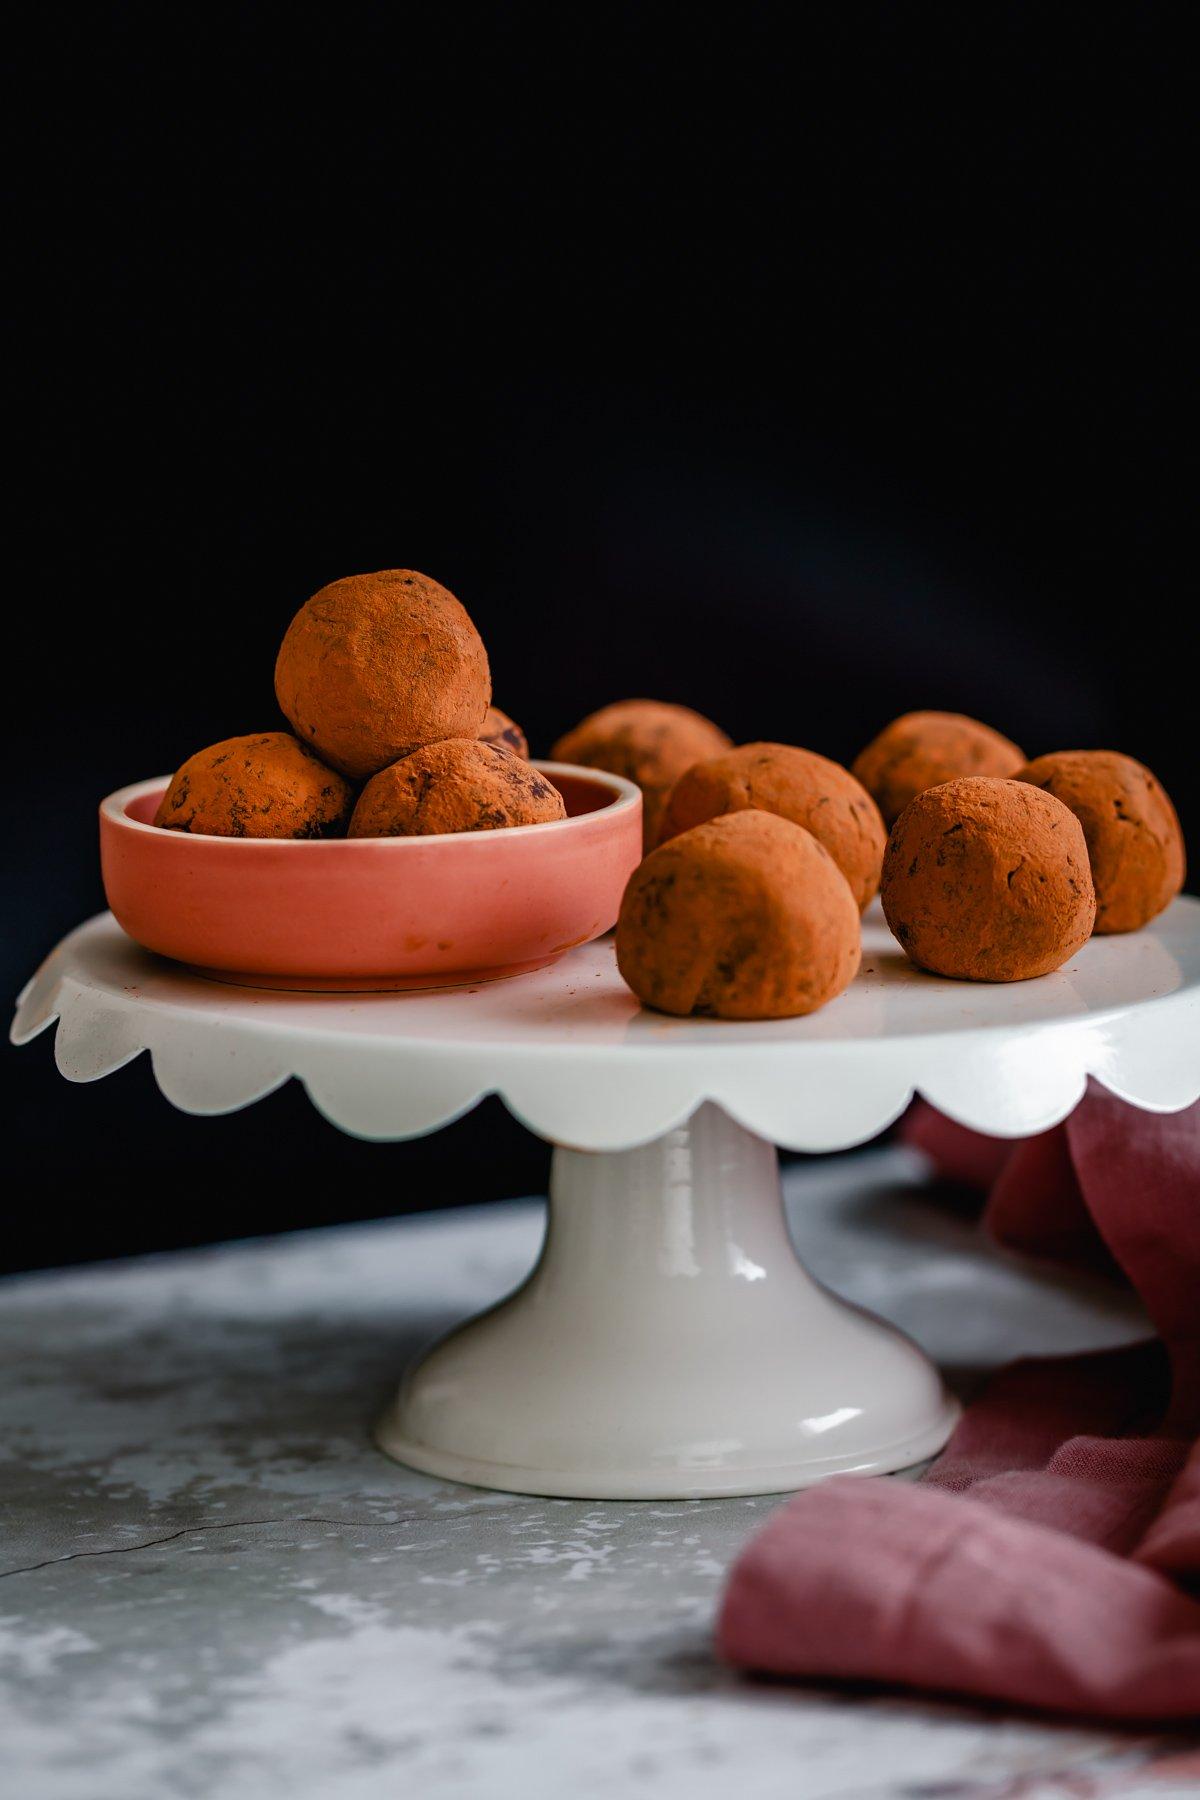 a cake stand with cocoa-dusted vegan Tiramisu truffles made with vegan cream cheese